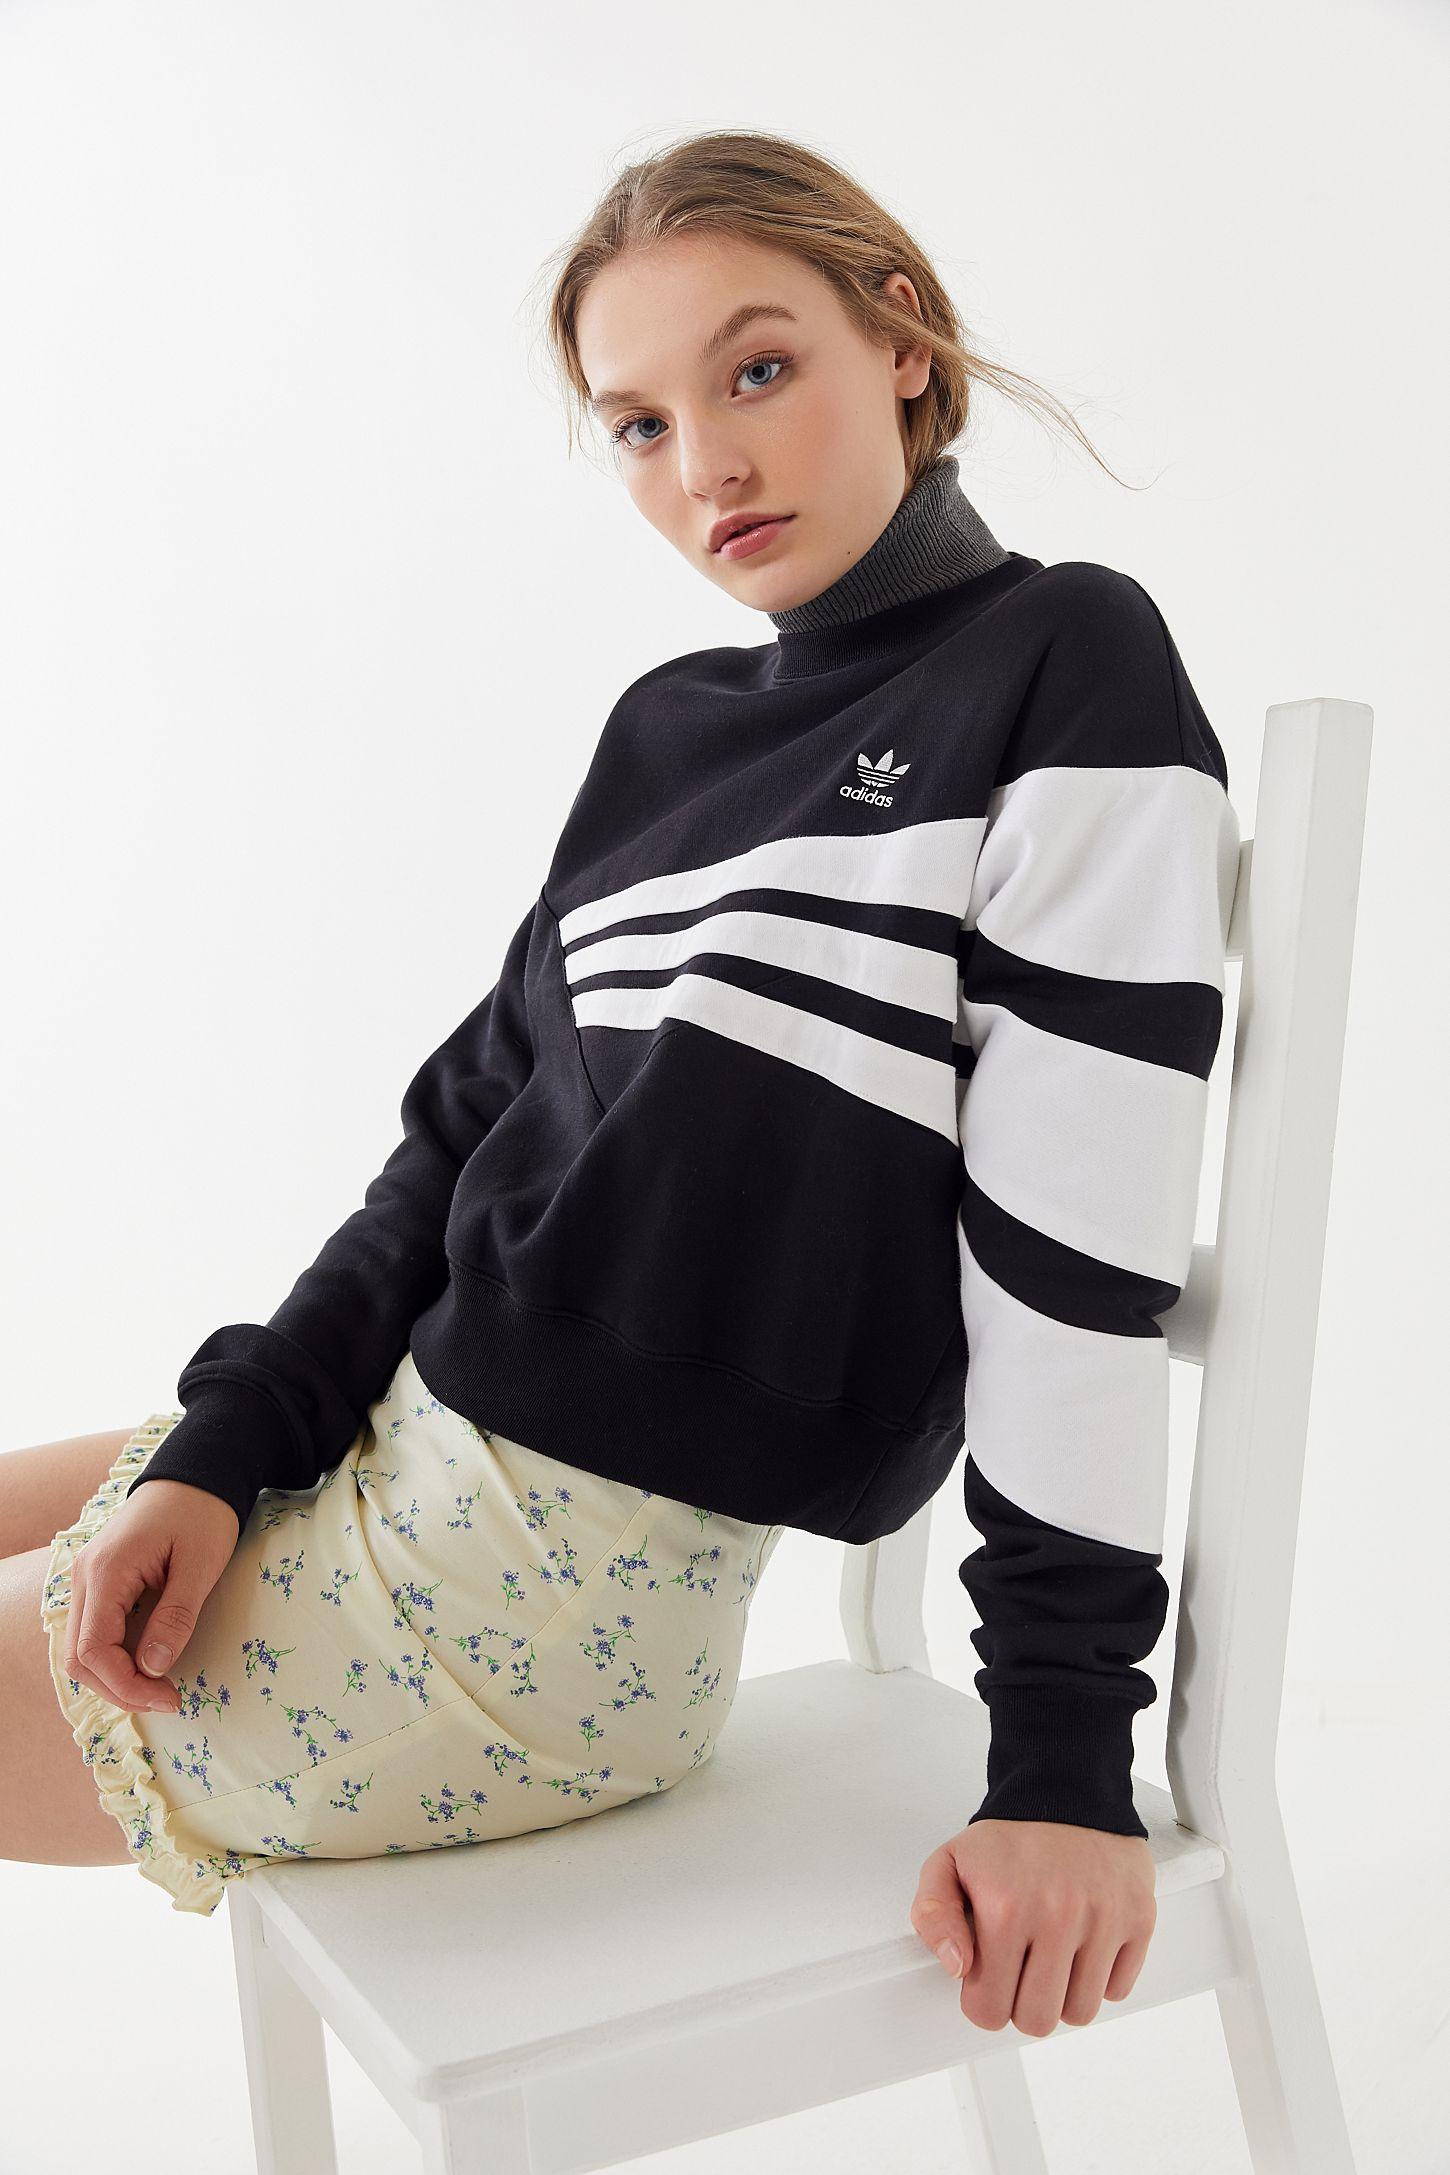 d9a61c1b746 adidas Geometric 3-Stripes Cropped Sweatshirt | Urban Outfitters Canada